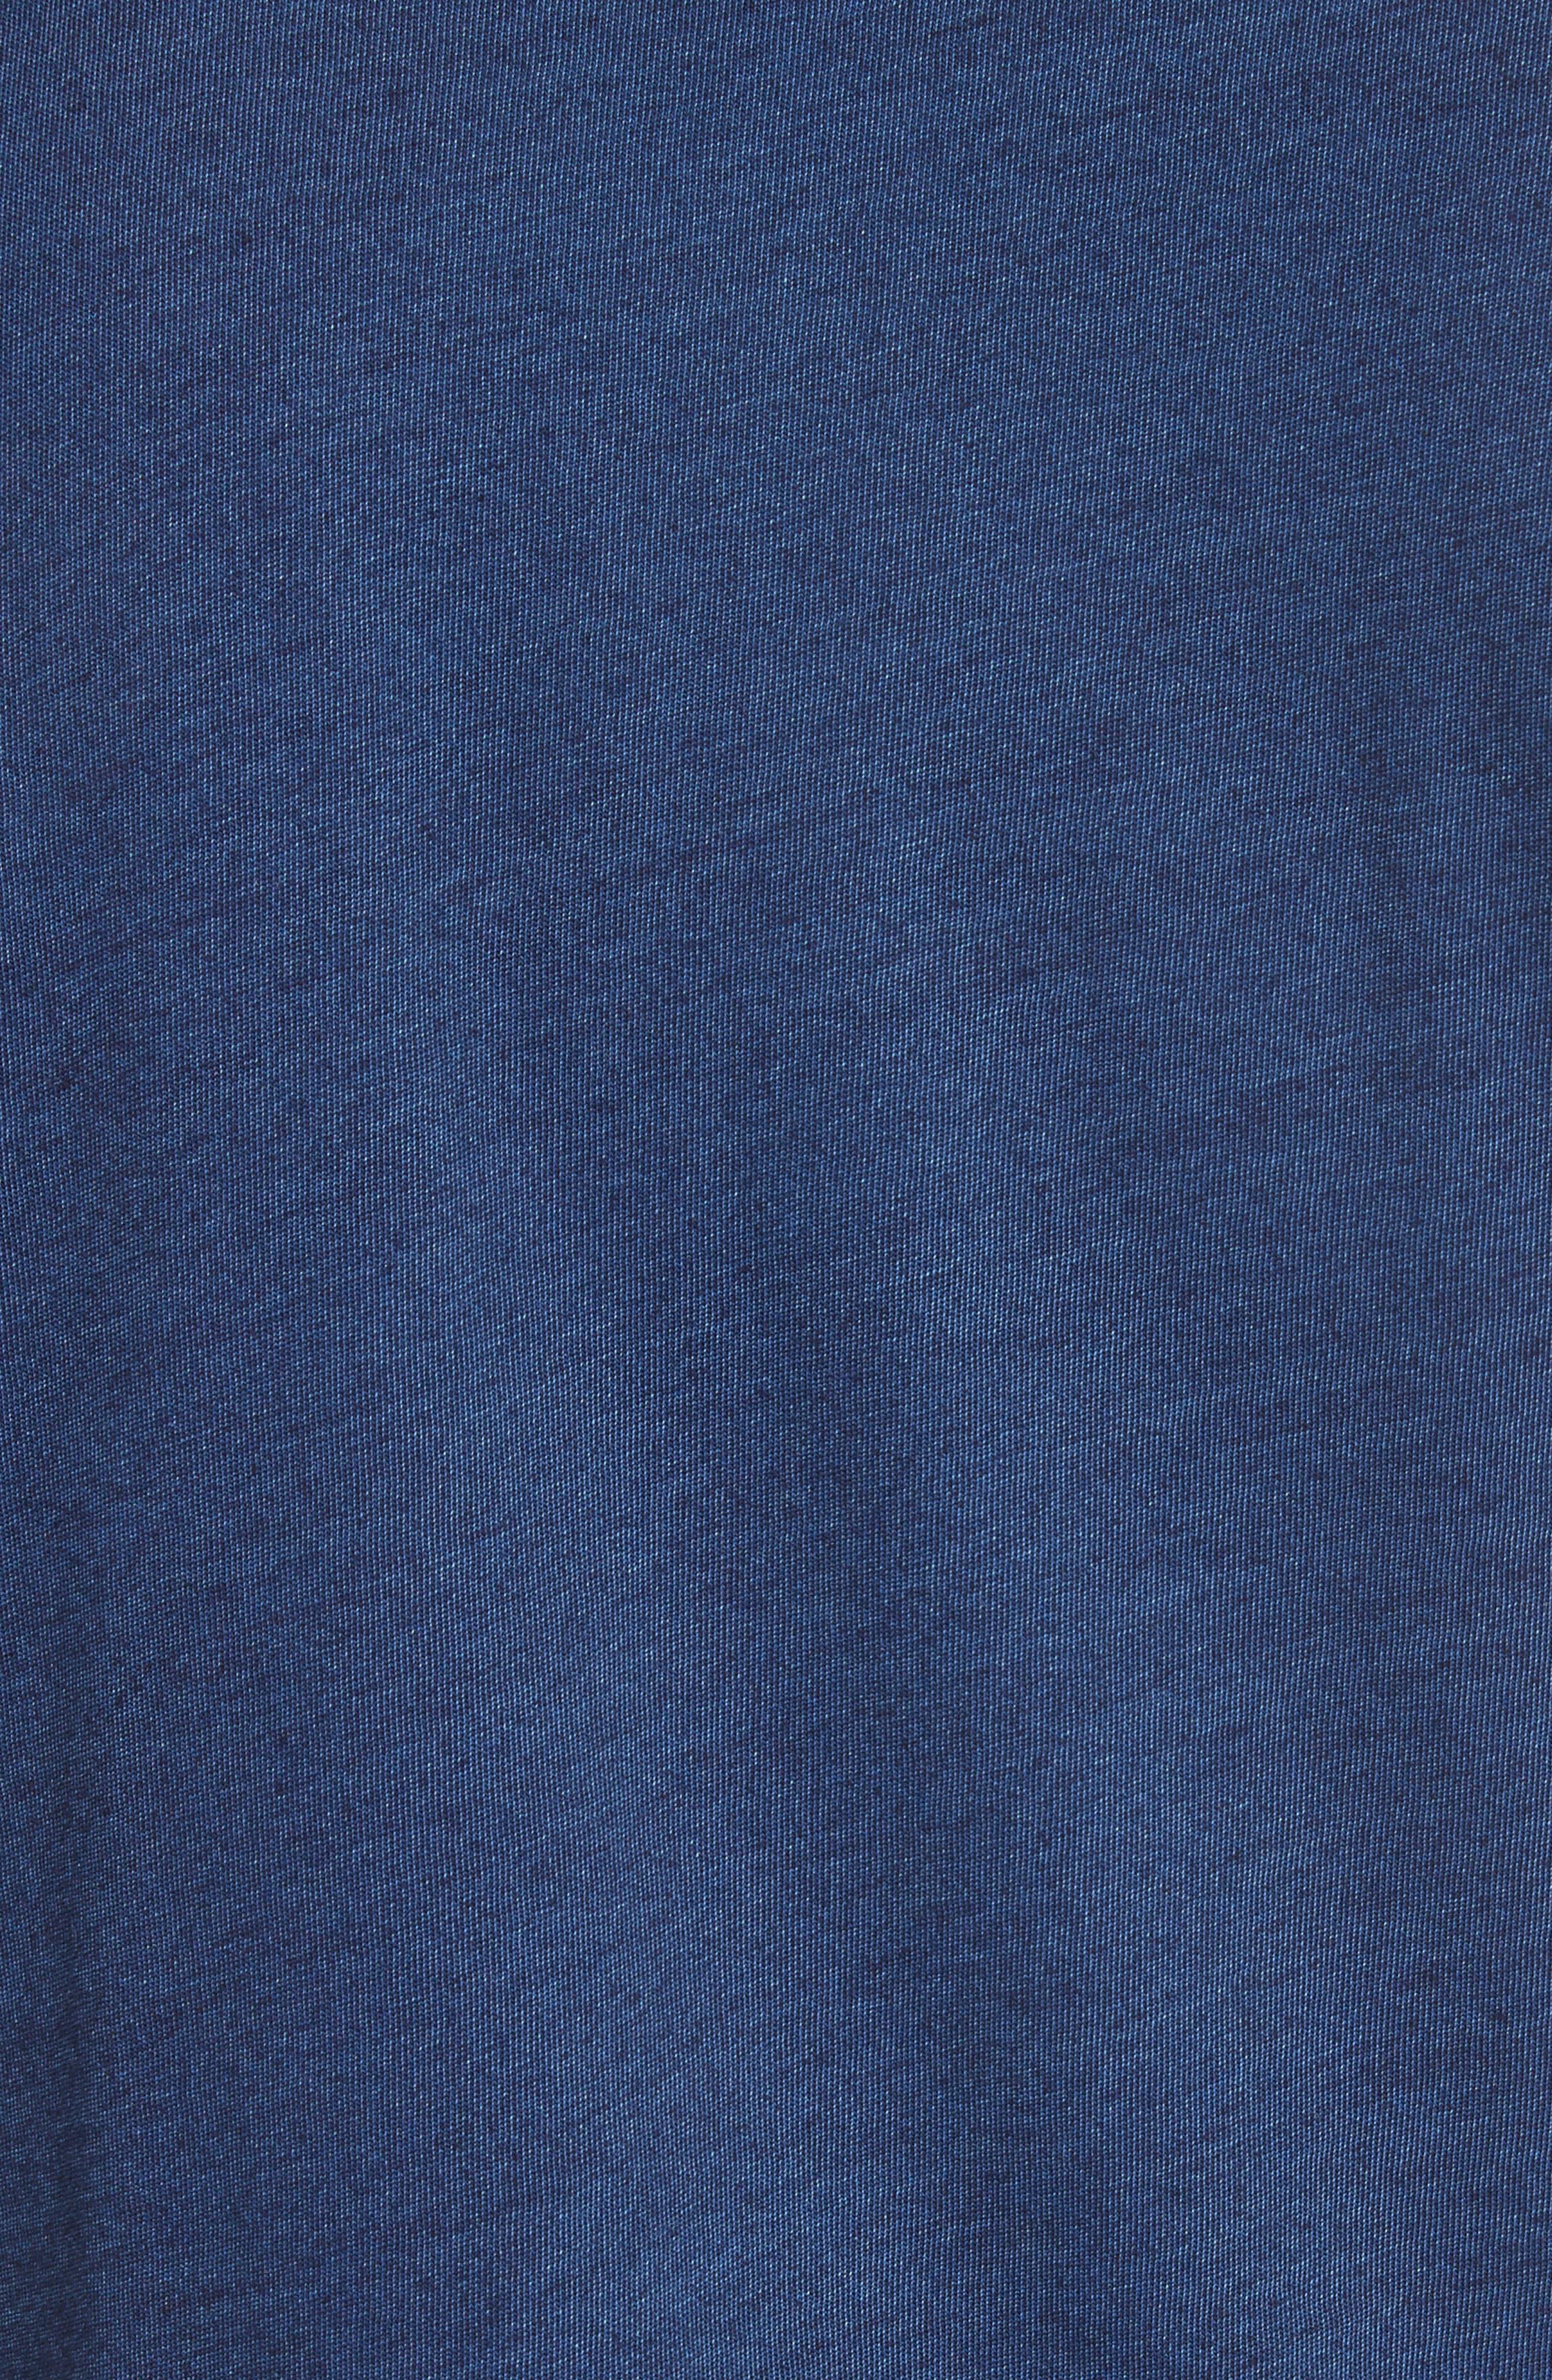 Niels Indigo T-Shirt,                             Alternate thumbnail 5, color,                             Indigo